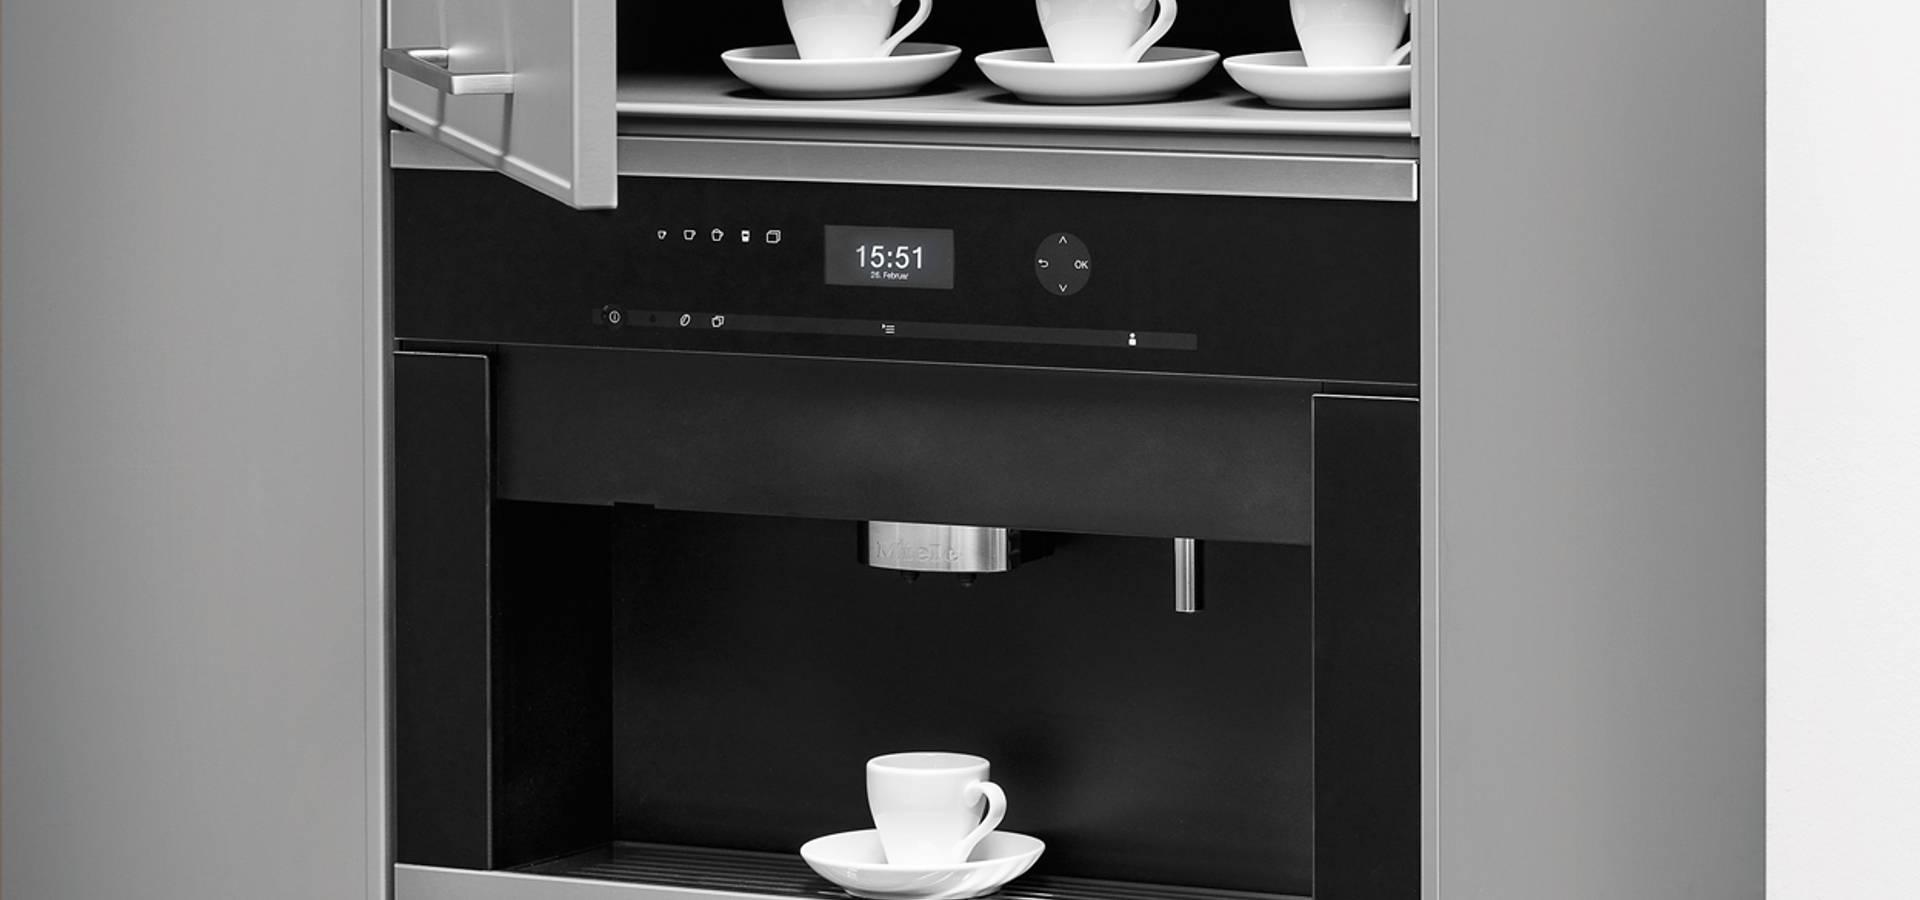 Fit kitchens dise adores de cocinas en swansea homify - Disenadores de cocinas ...